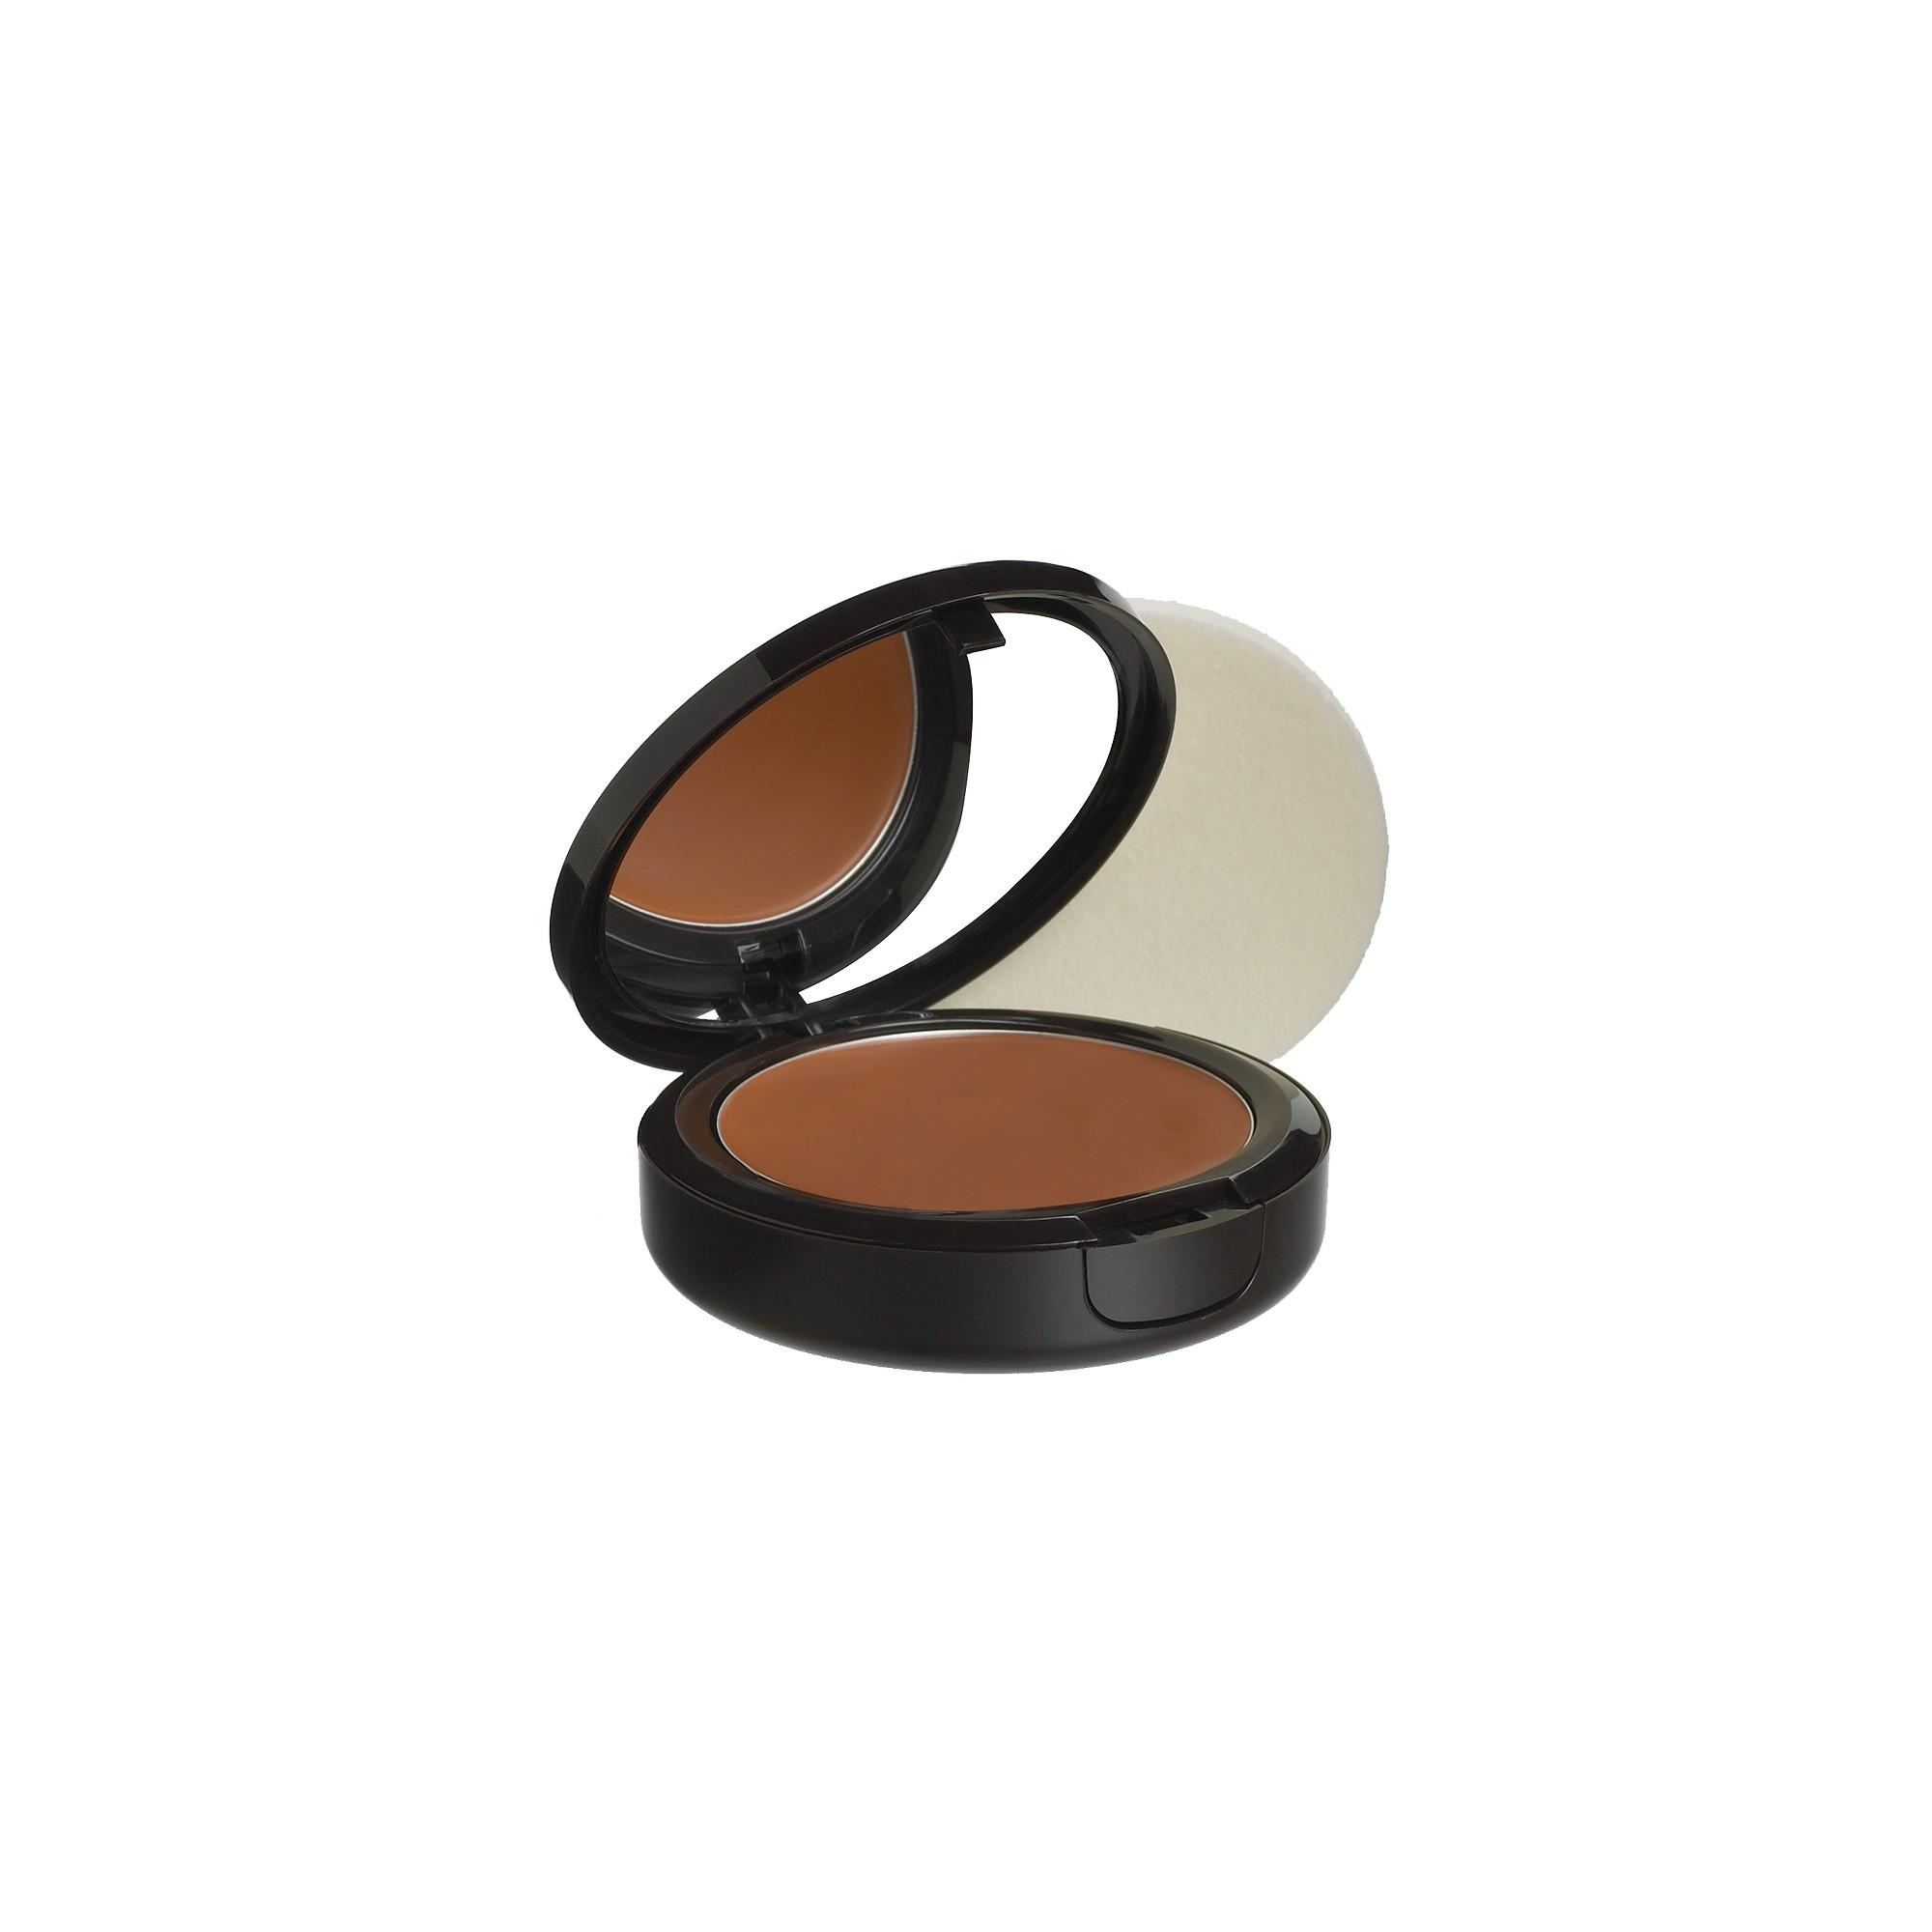 IMAN Cream to Powder Foundation - Earth 1